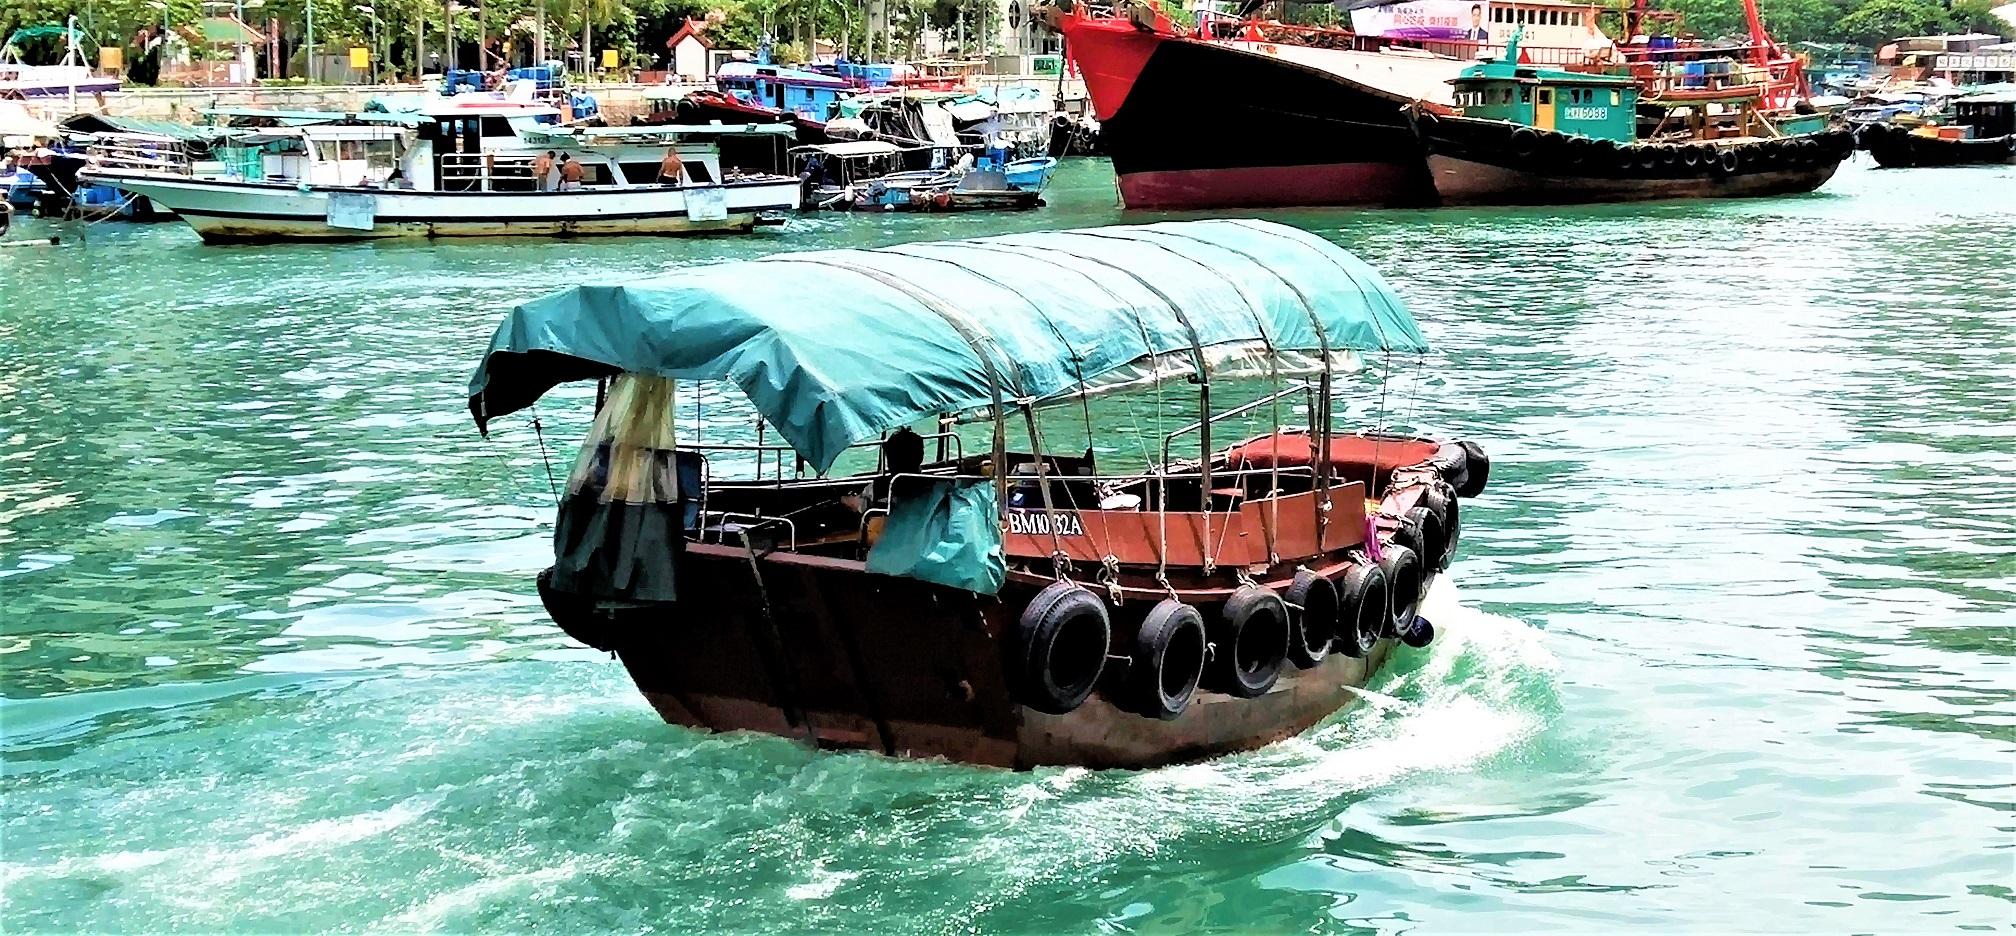 It is nice for travelers to take the sampan ride at Aberdeen fishing village.